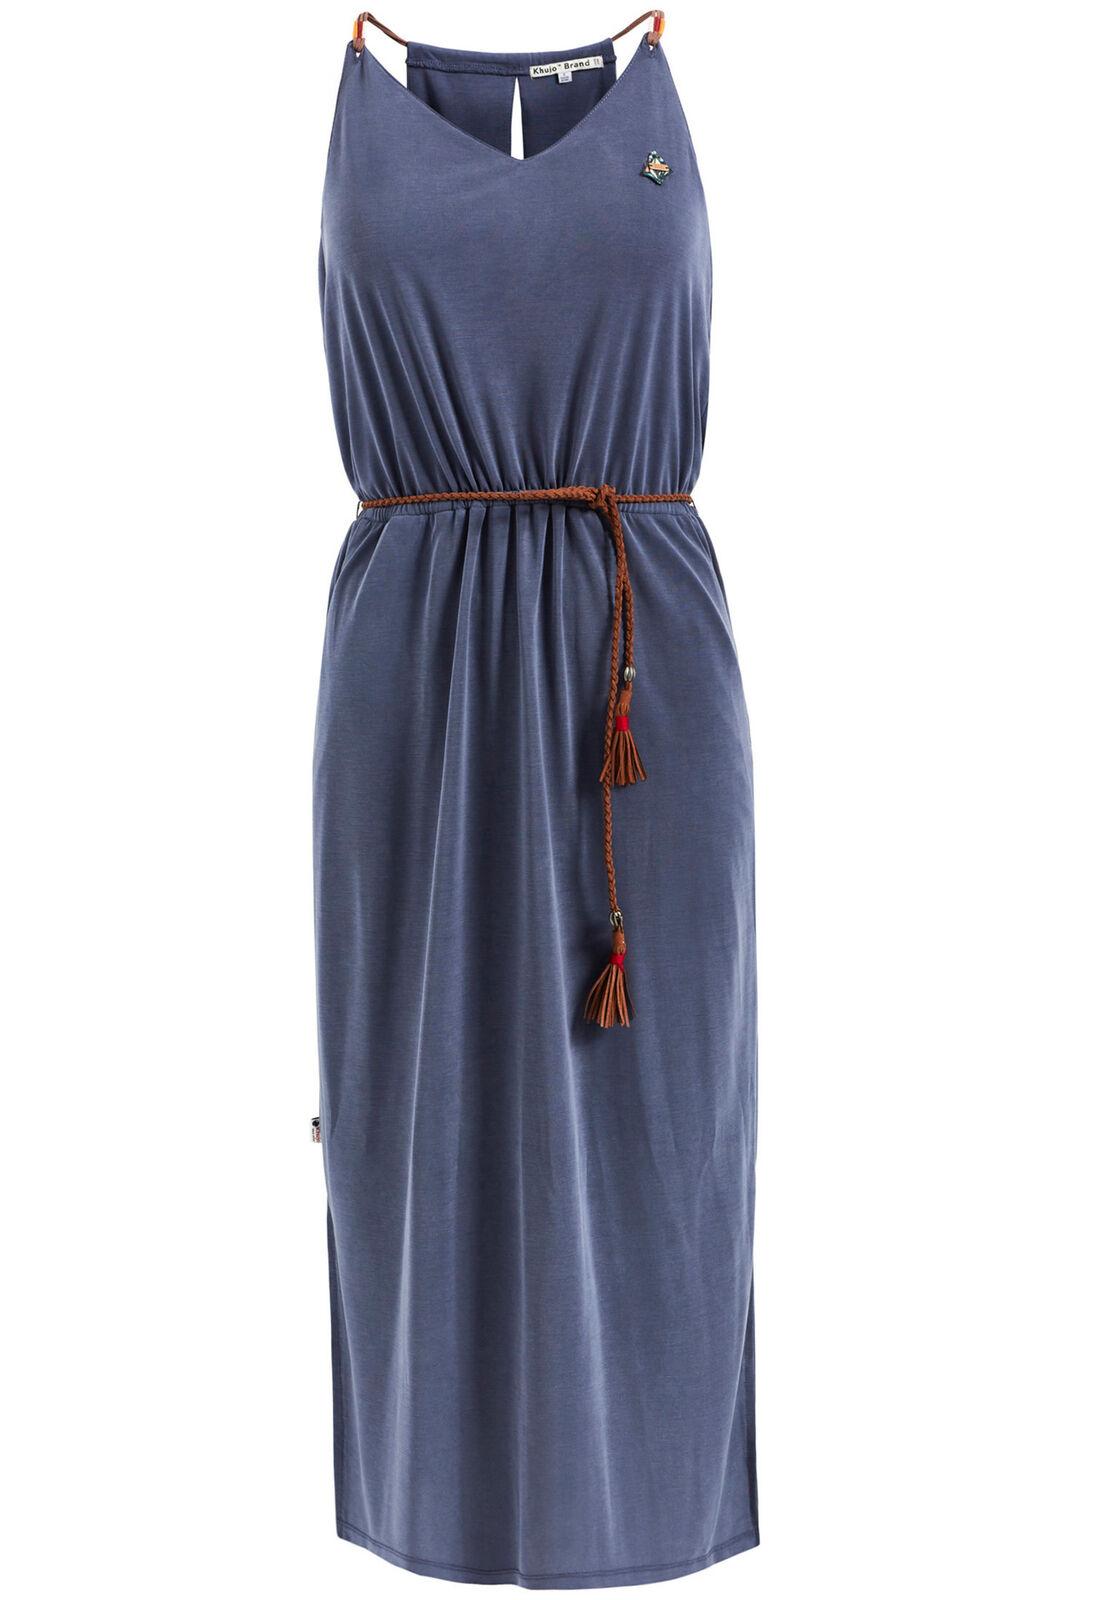 Khujo Damen Kleid MOMILANI mit Ledergürtel Jerseykleid Spaghettiträger ärmellos